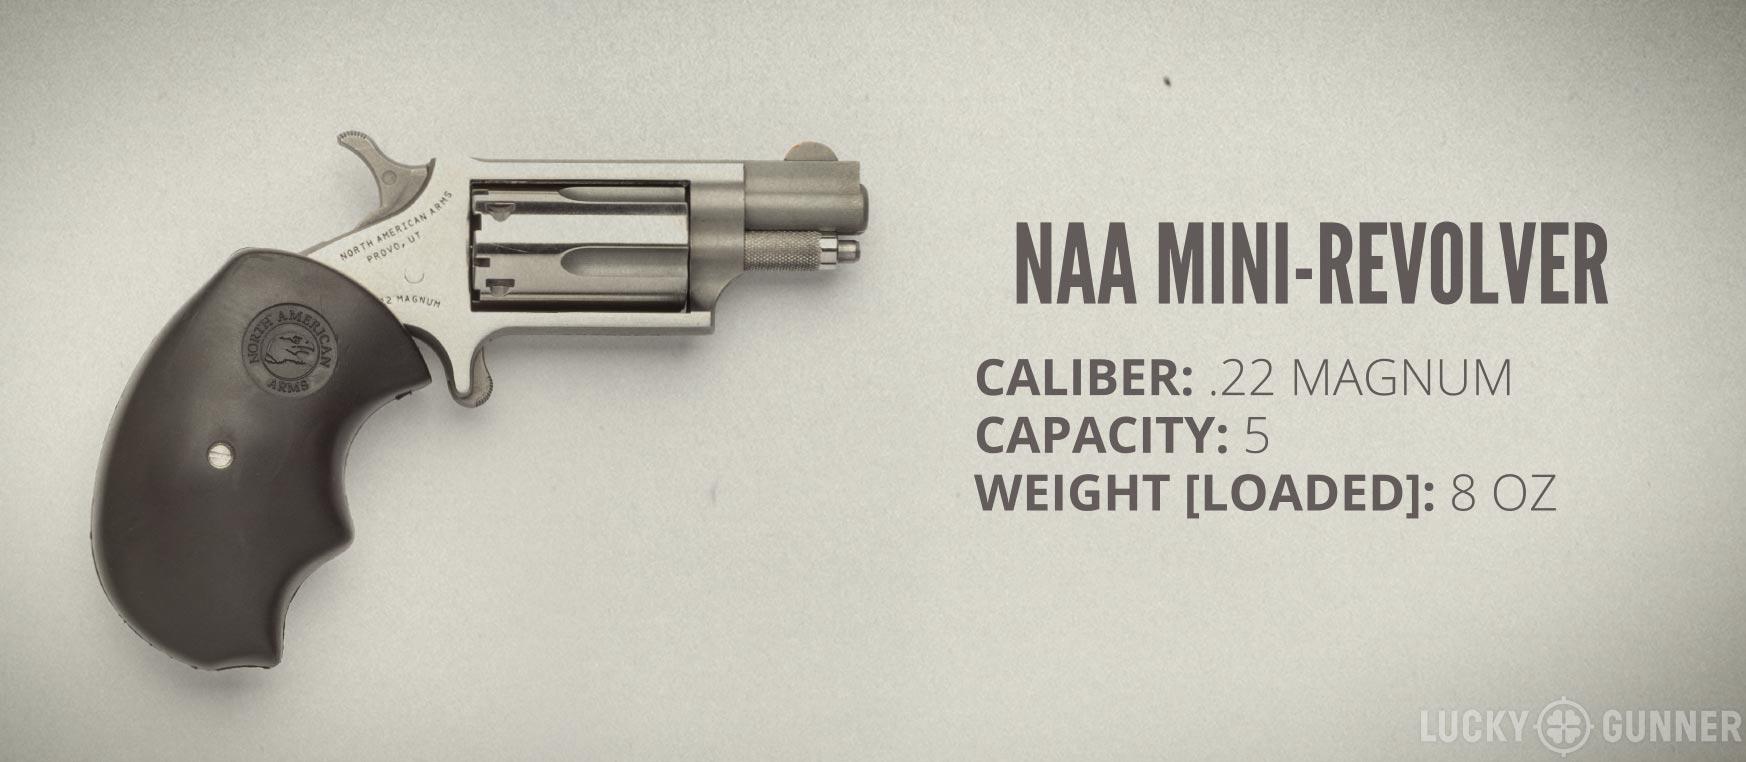 The NAA Mini Revolver: You Can Do Better - Lucky Gunner Lounge